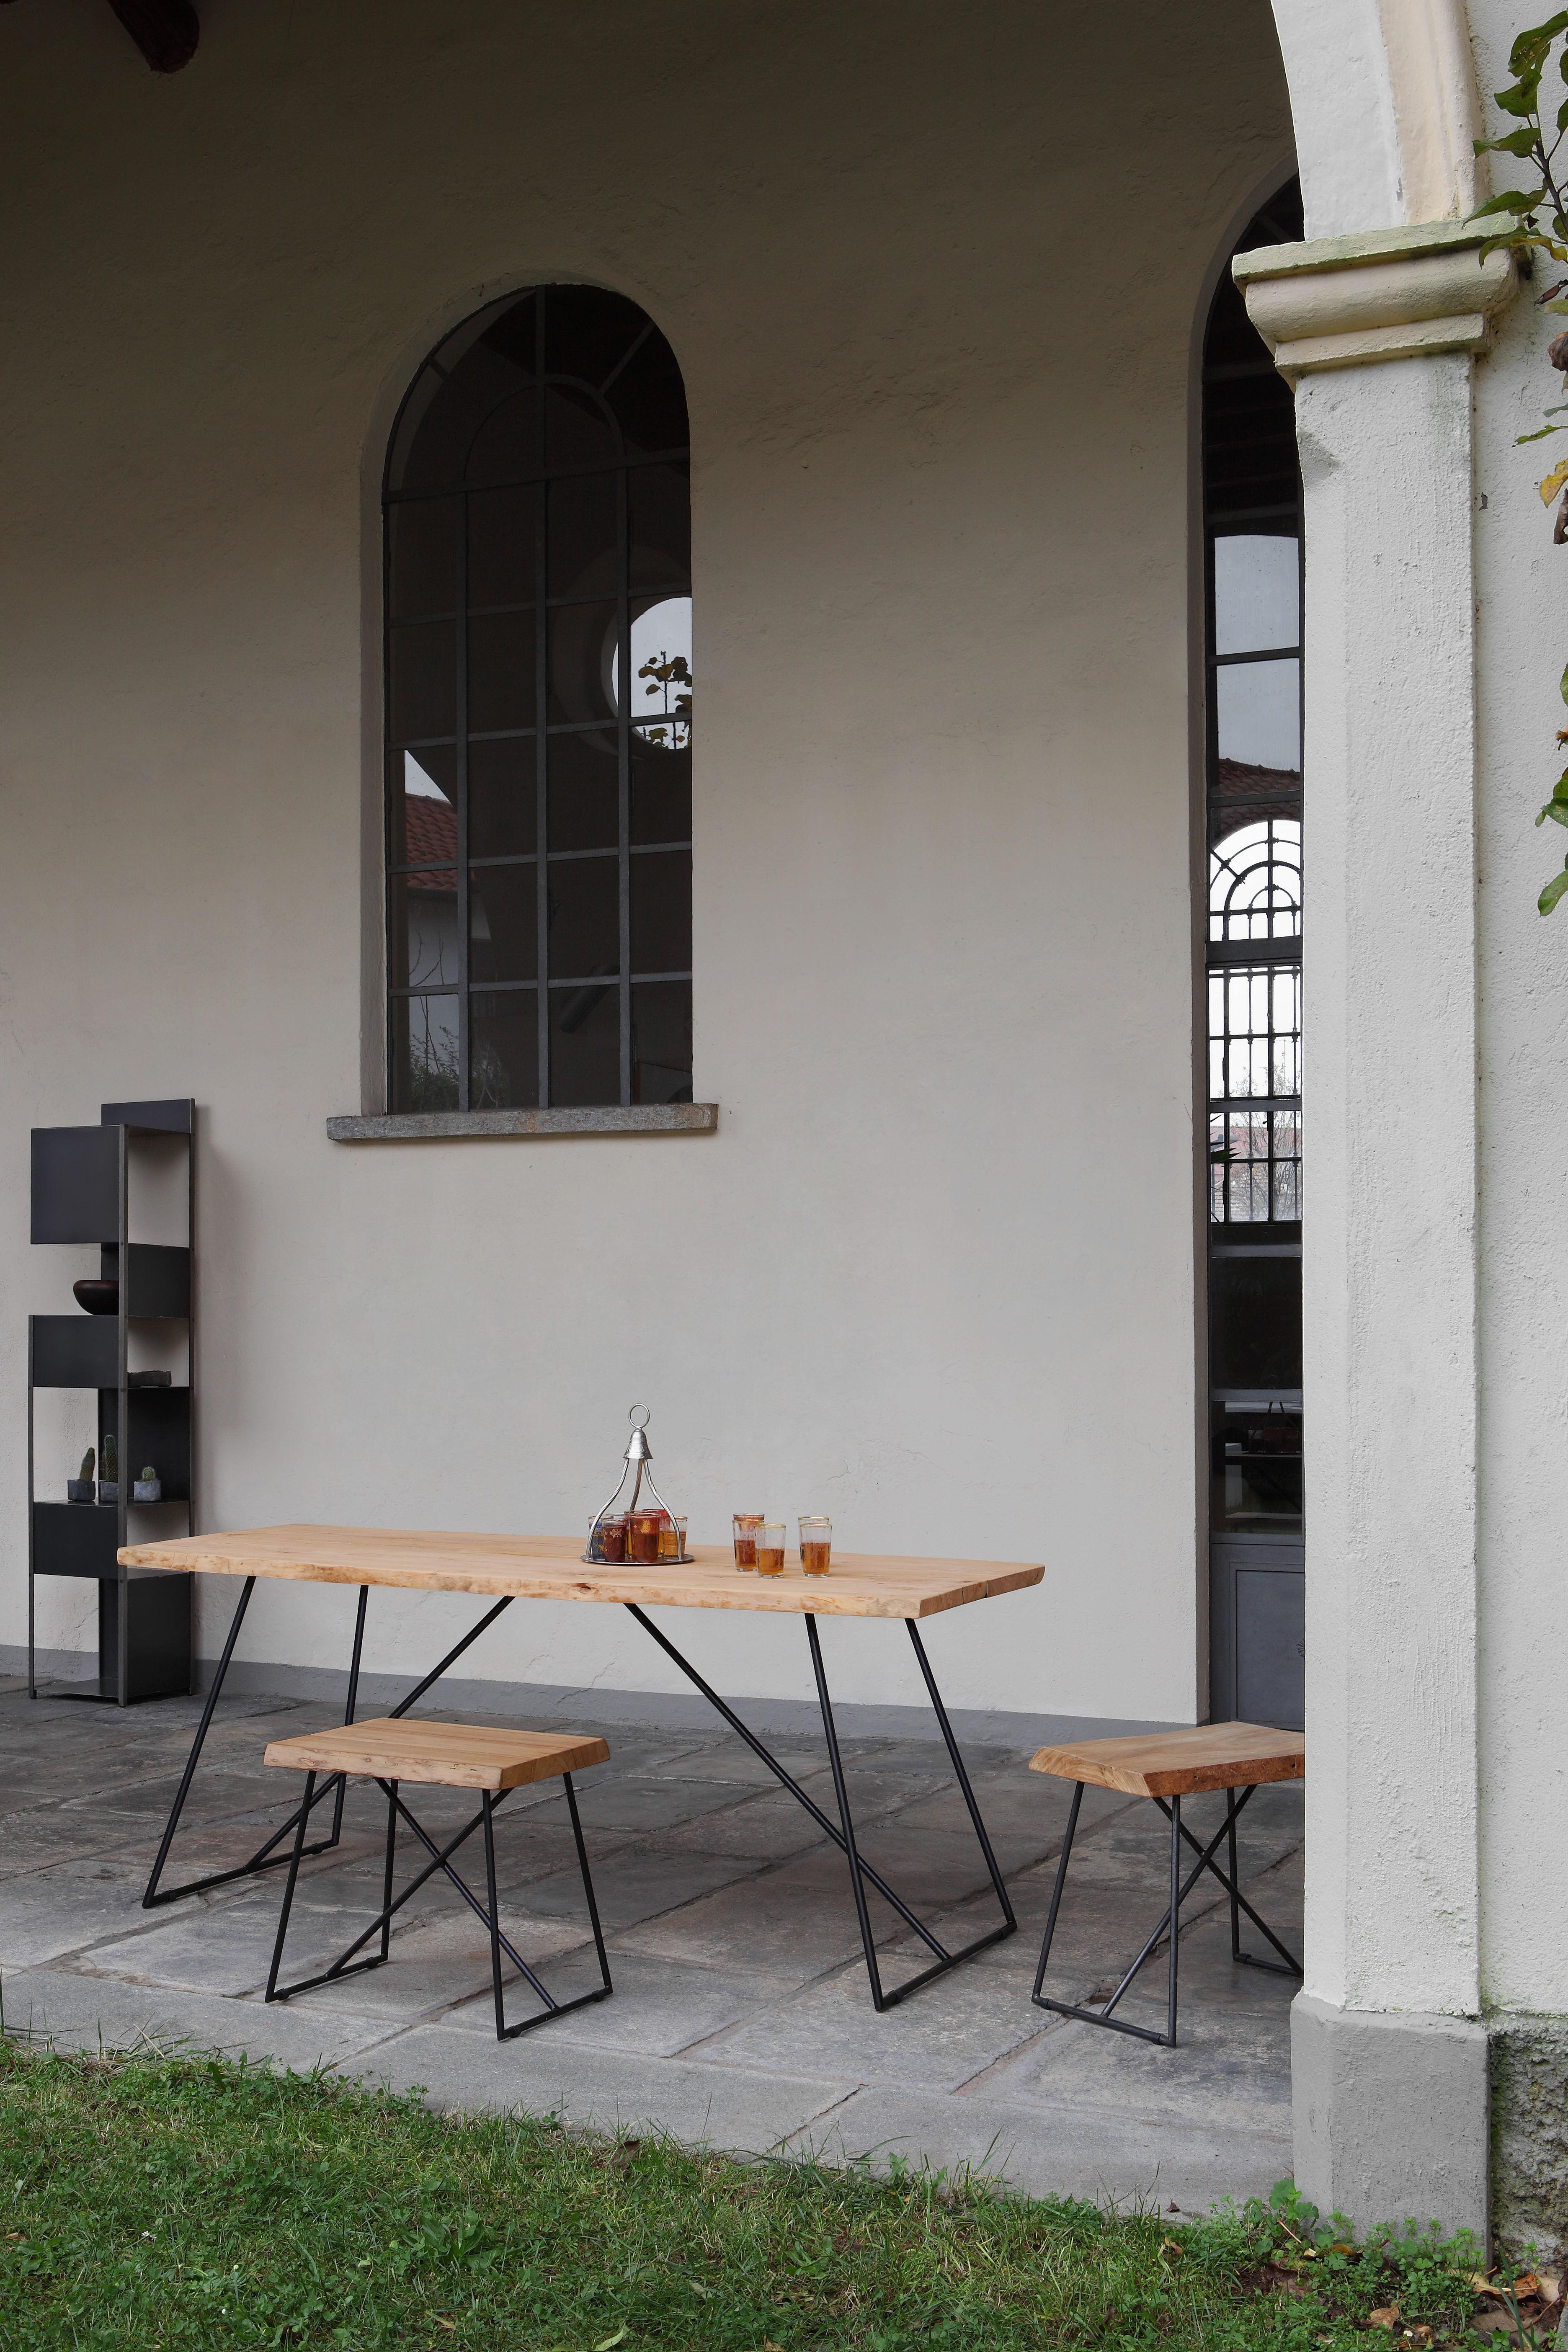 table old times 190 x 70 cm bois naturel pi tement noir zeus. Black Bedroom Furniture Sets. Home Design Ideas